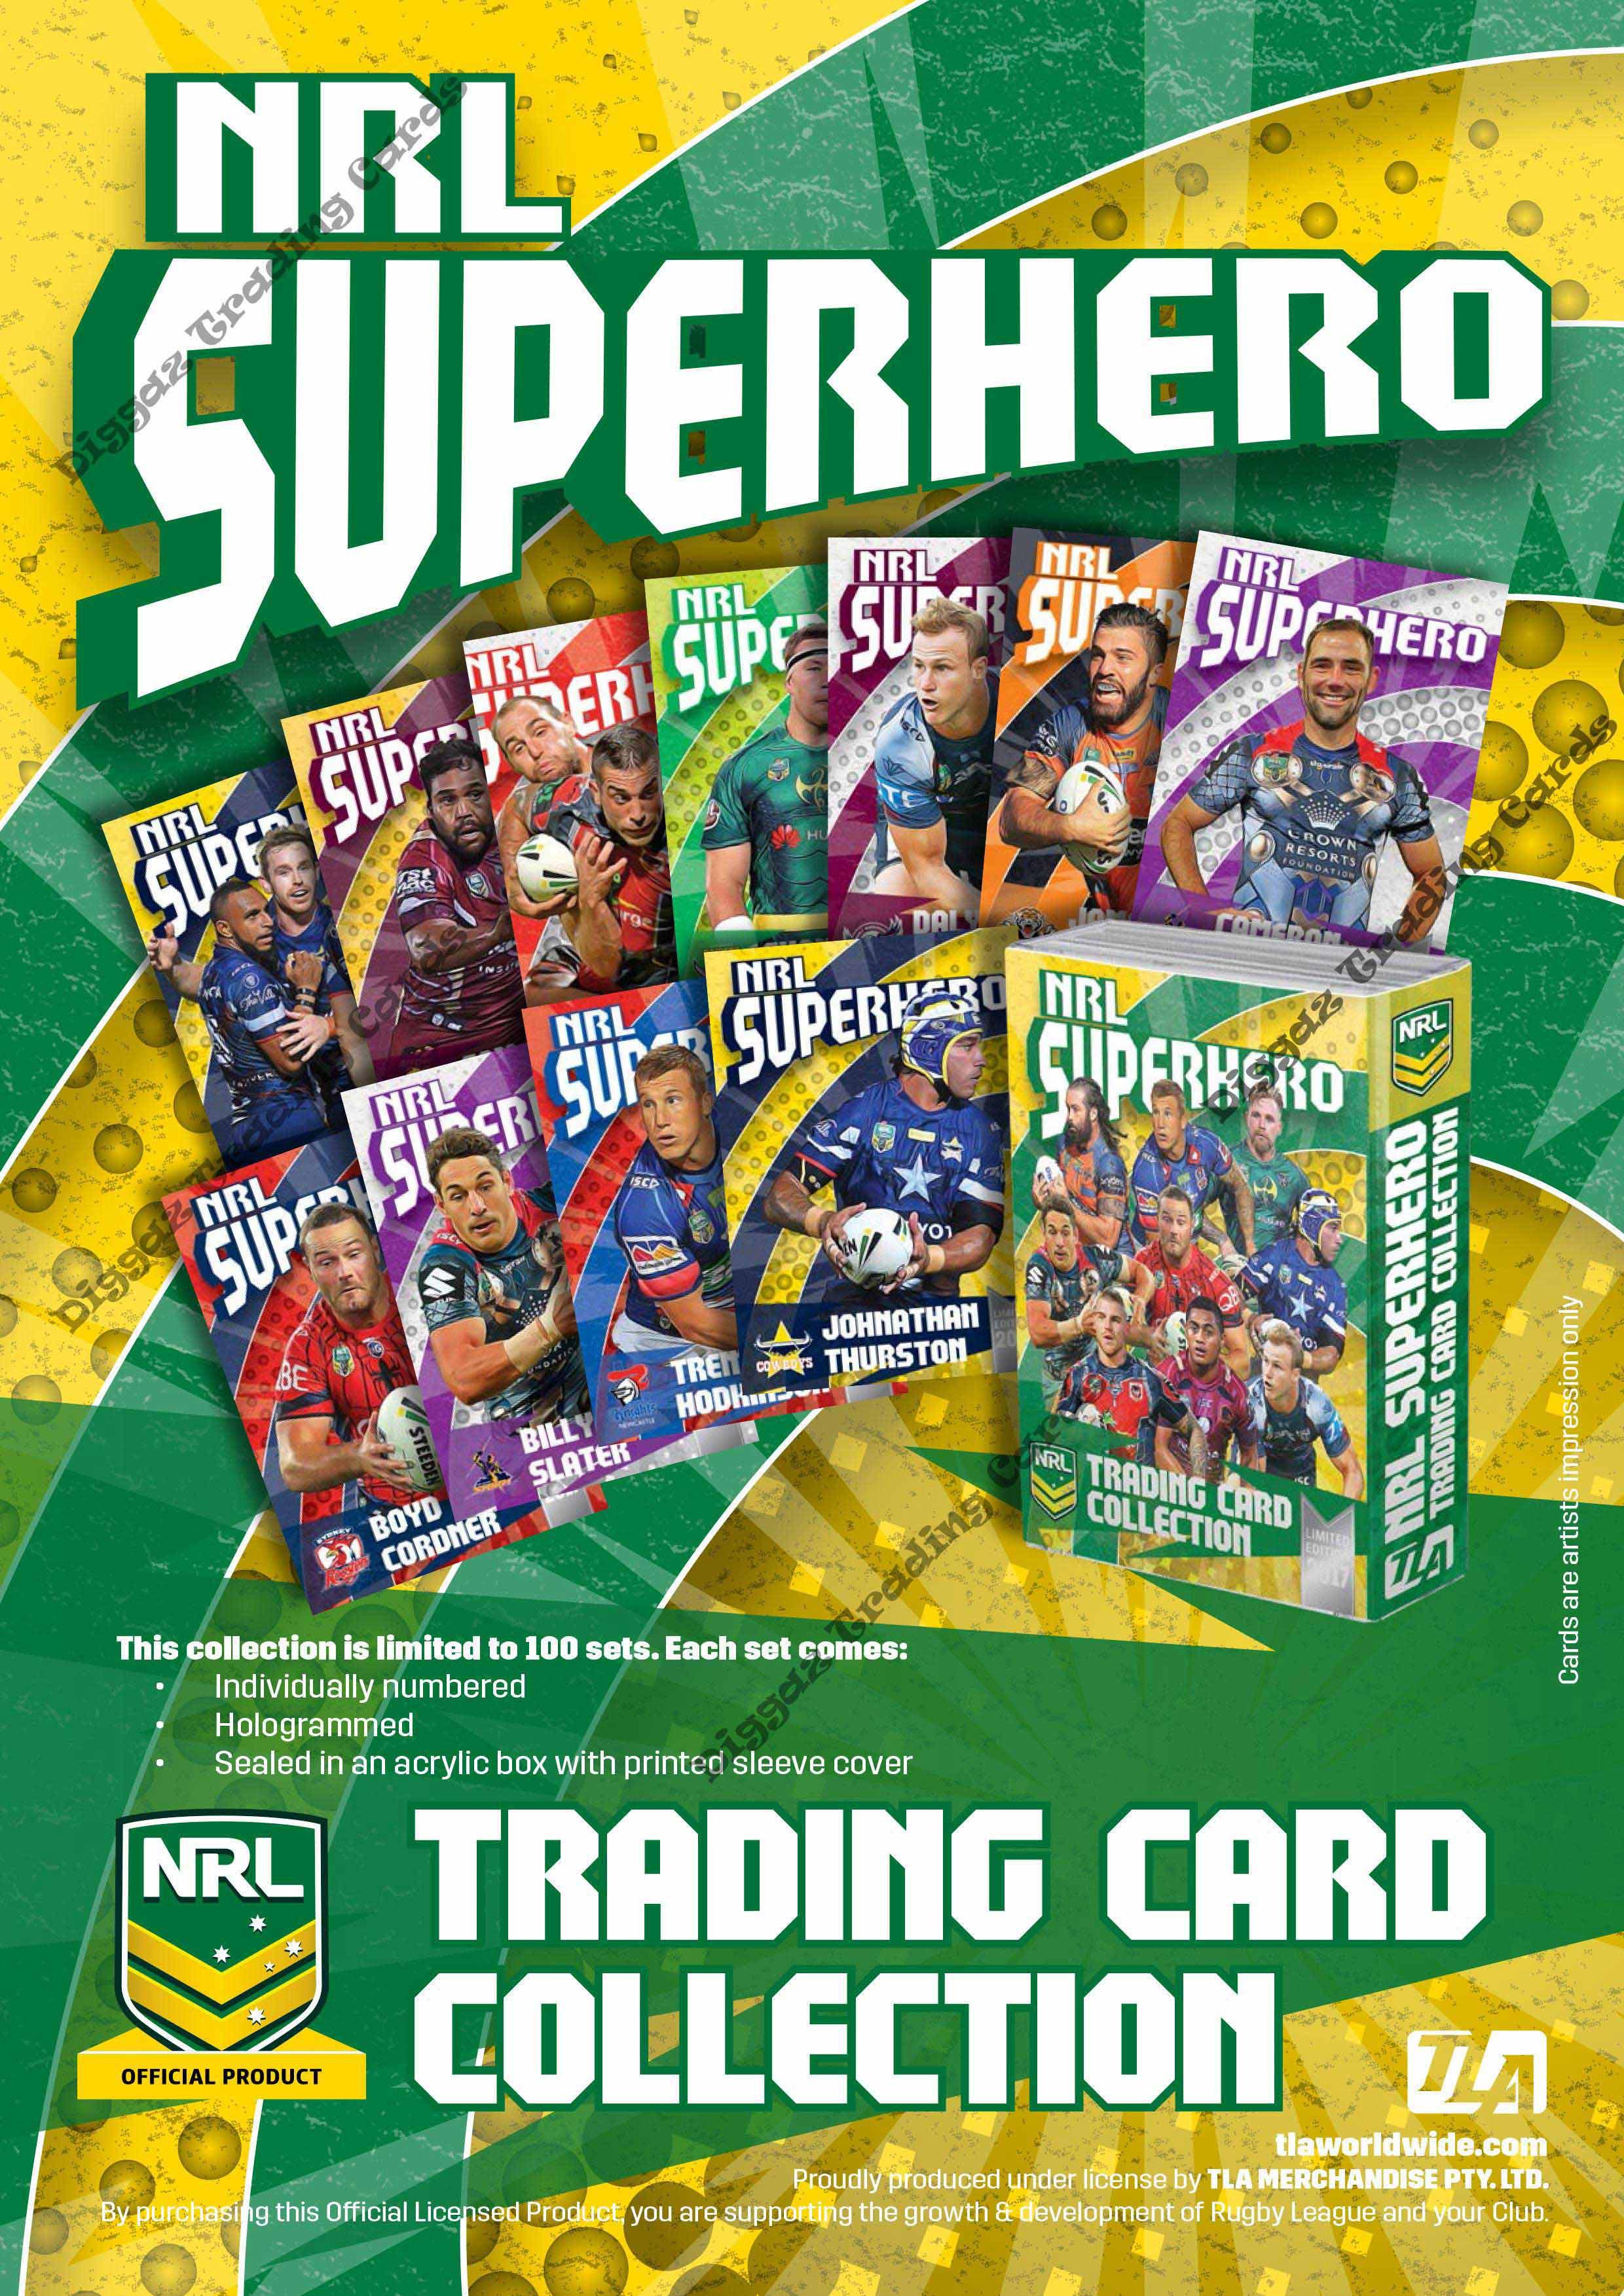 2017 NRL Superhero